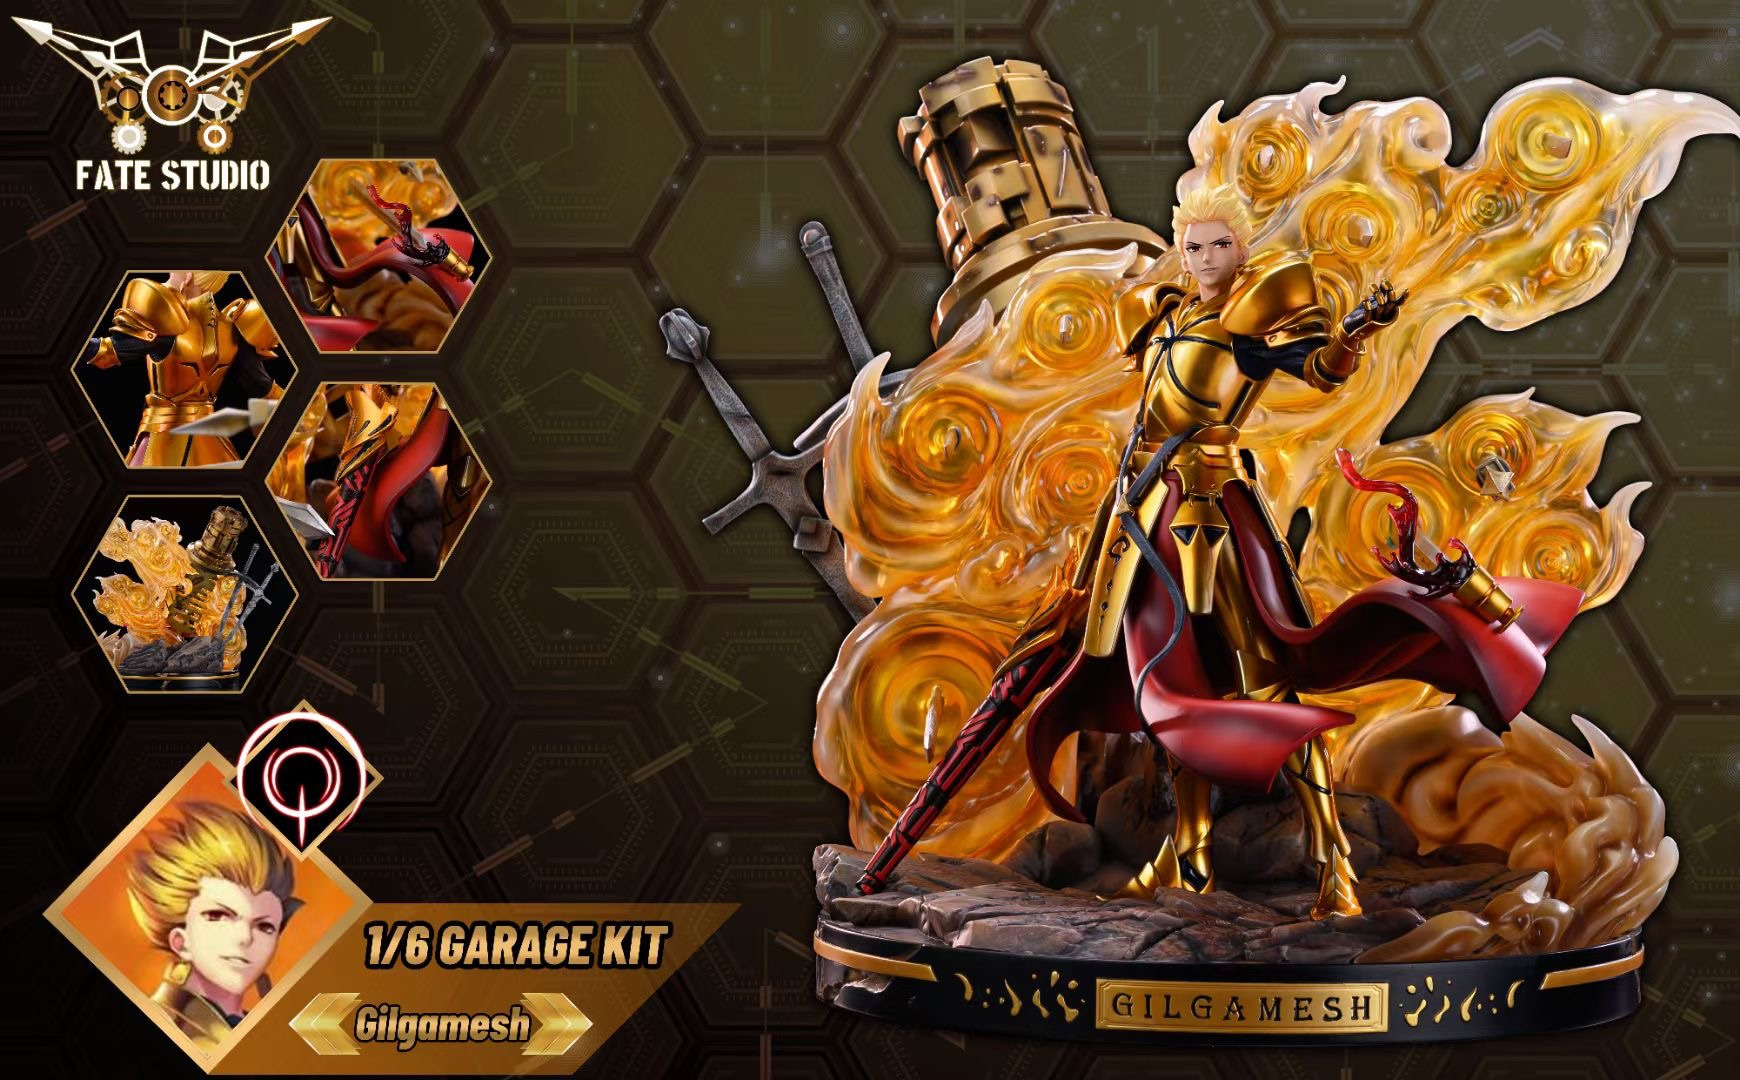 Gilgamesh กิลกาเมช Fate Studio (มัดจำ) [[SOLD OUT]]